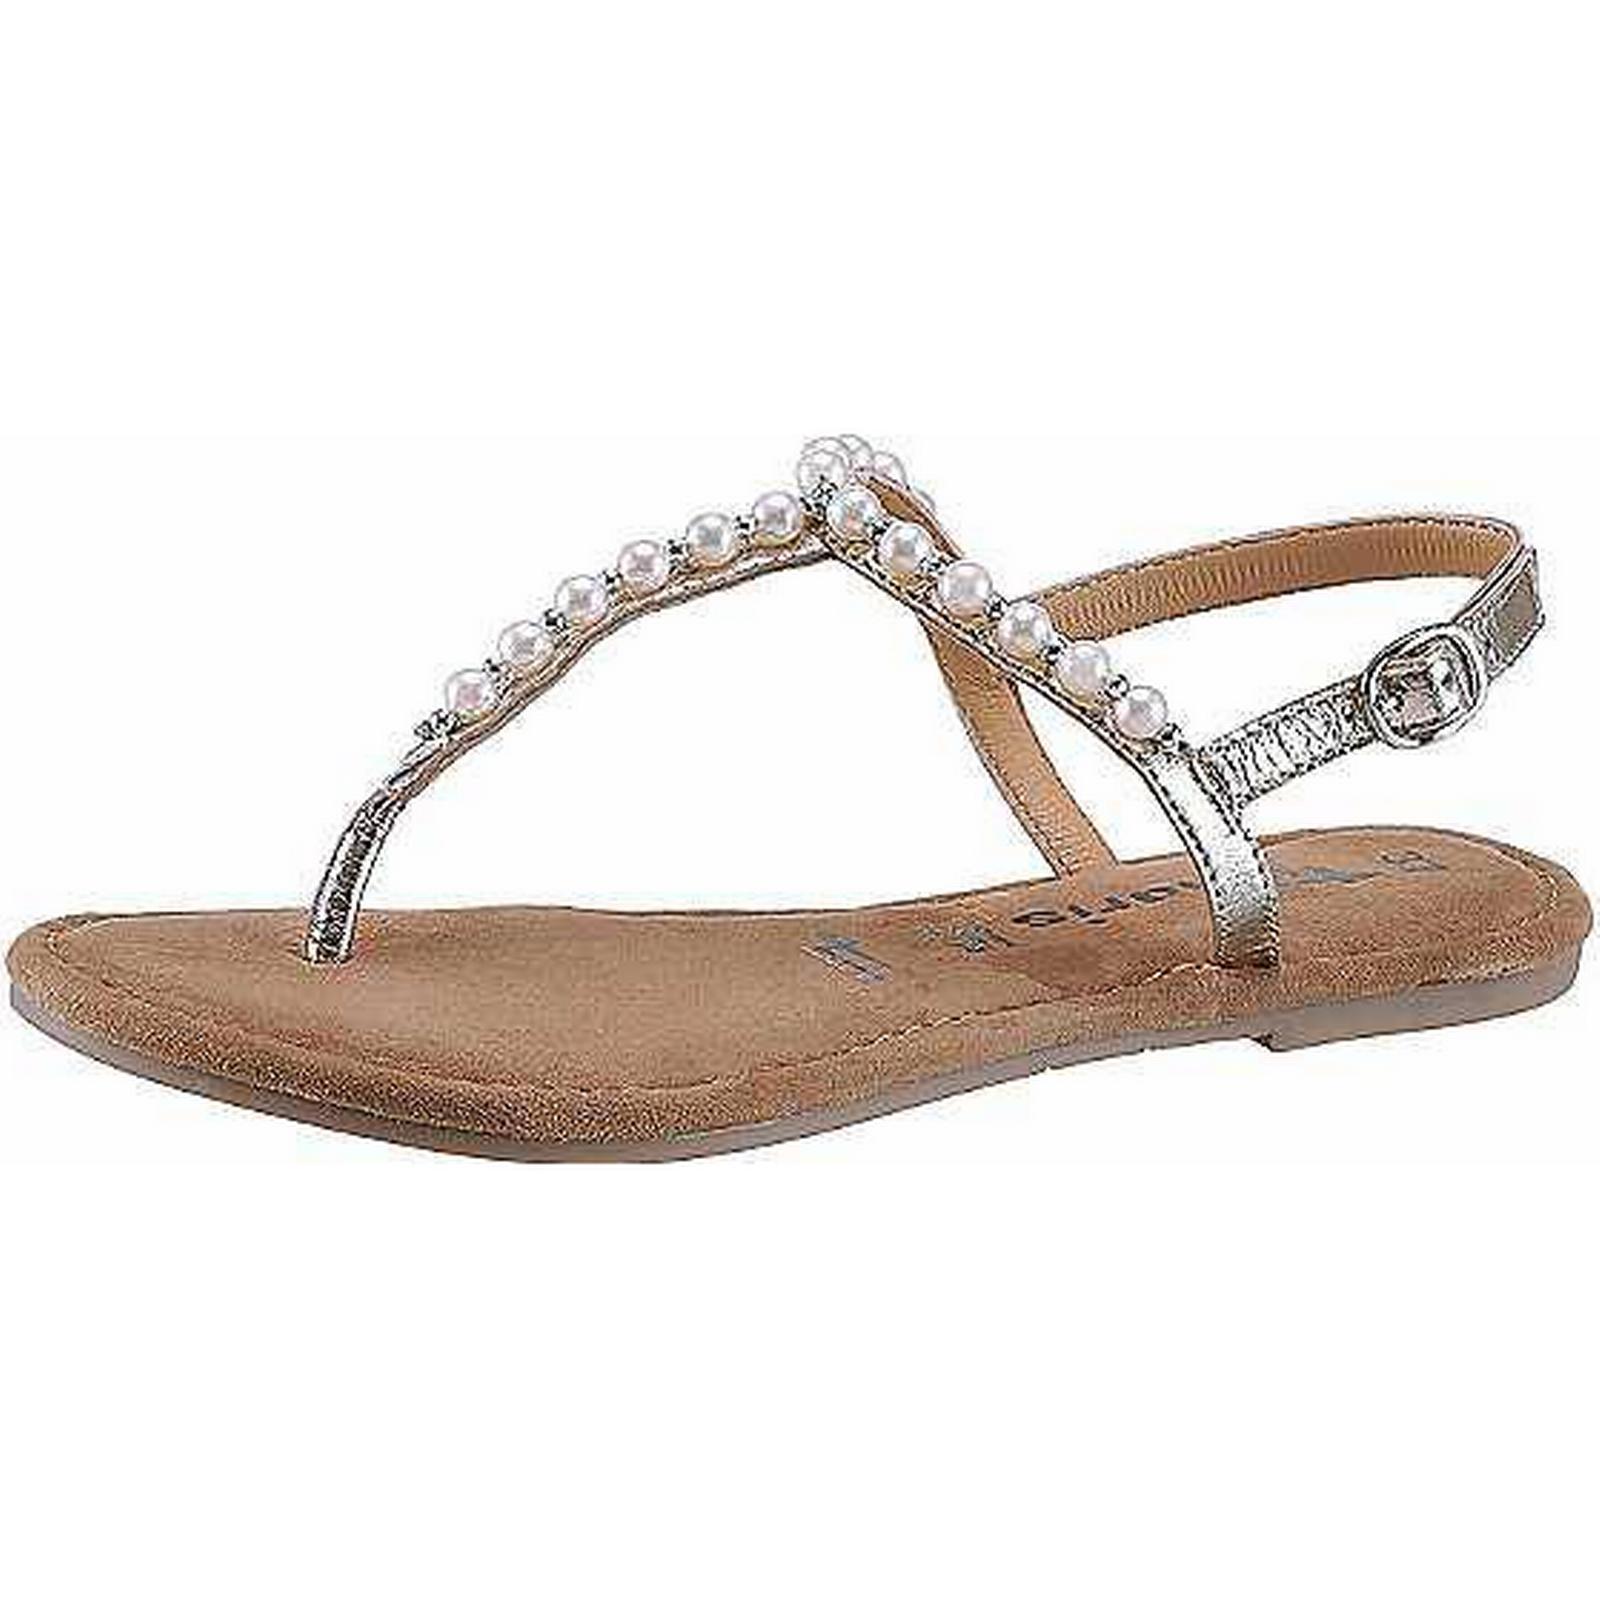 Tamaris Tamaris:Gentleman/Lady: Embellished Toe-Post Sandals by Tamaris:Gentleman/Lady: Tamaris Have good goods 2de4fd